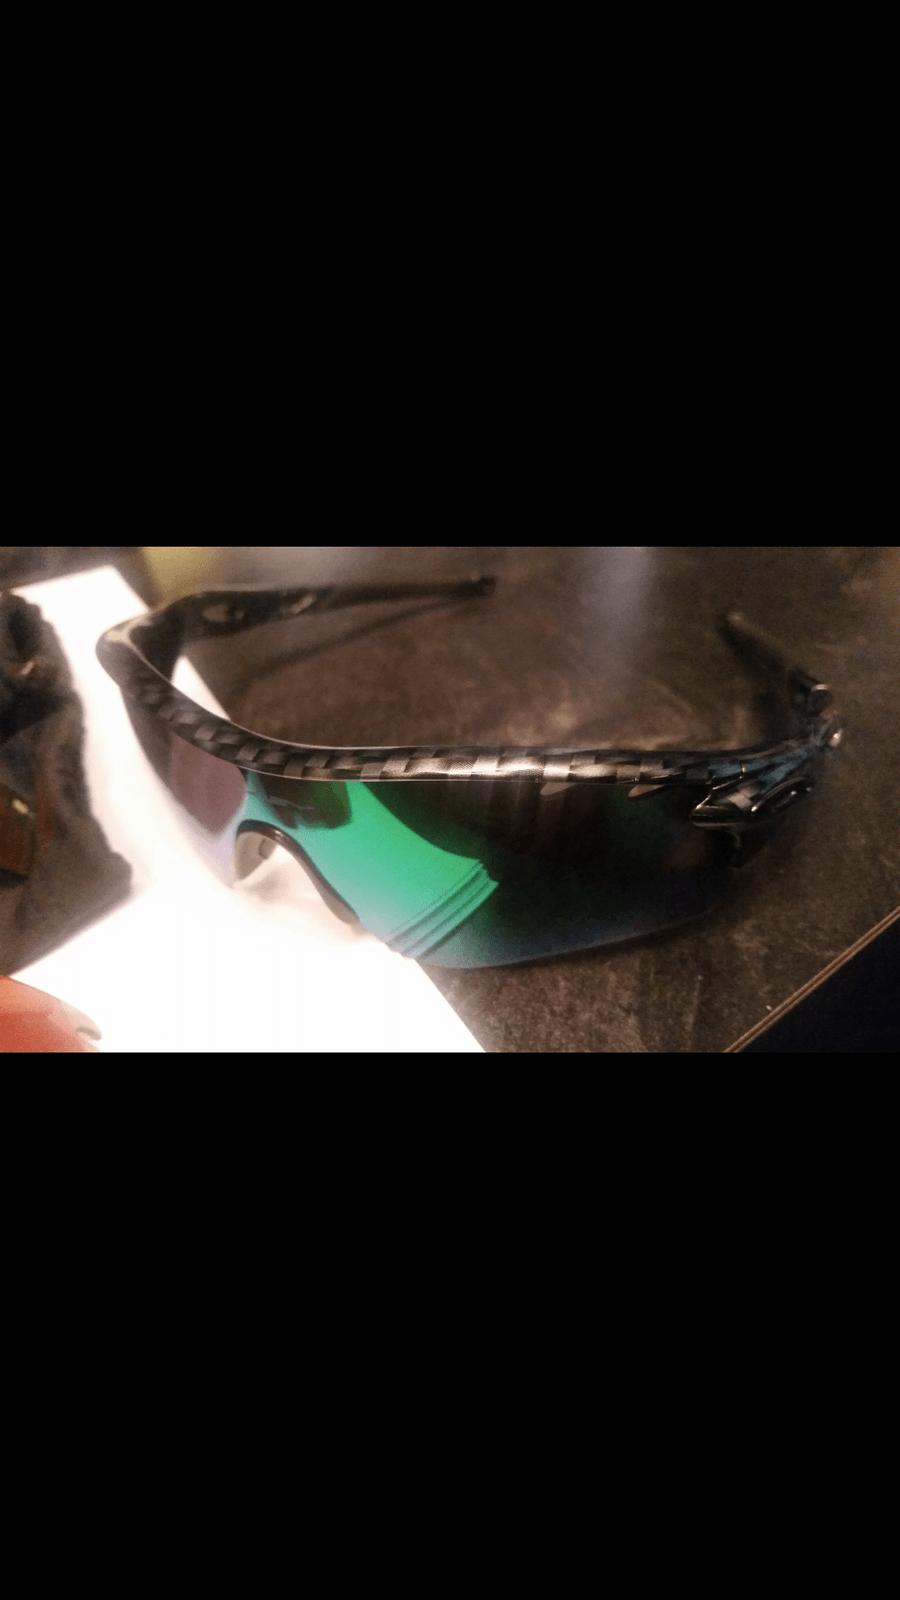 Carbon Fibre Radarlock with 6 lenses - Screenshot_2015-07-13-16-58-36.png